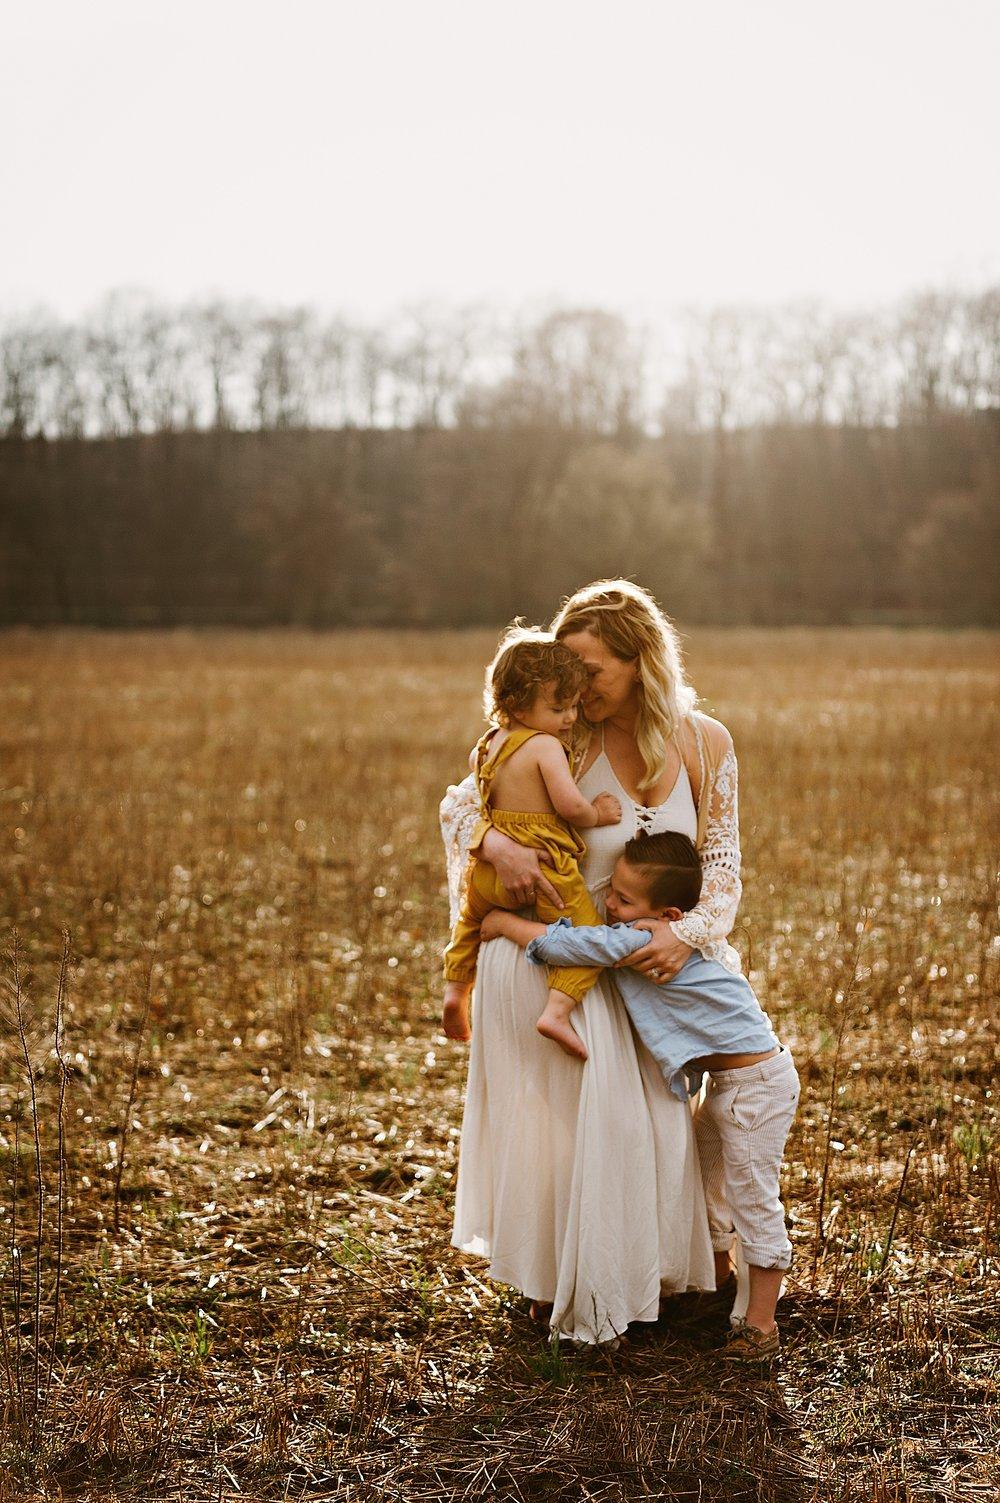 lauren-grayson-photography-akron-ohio-best-family-photos-2018-cleveland_0001.jpg